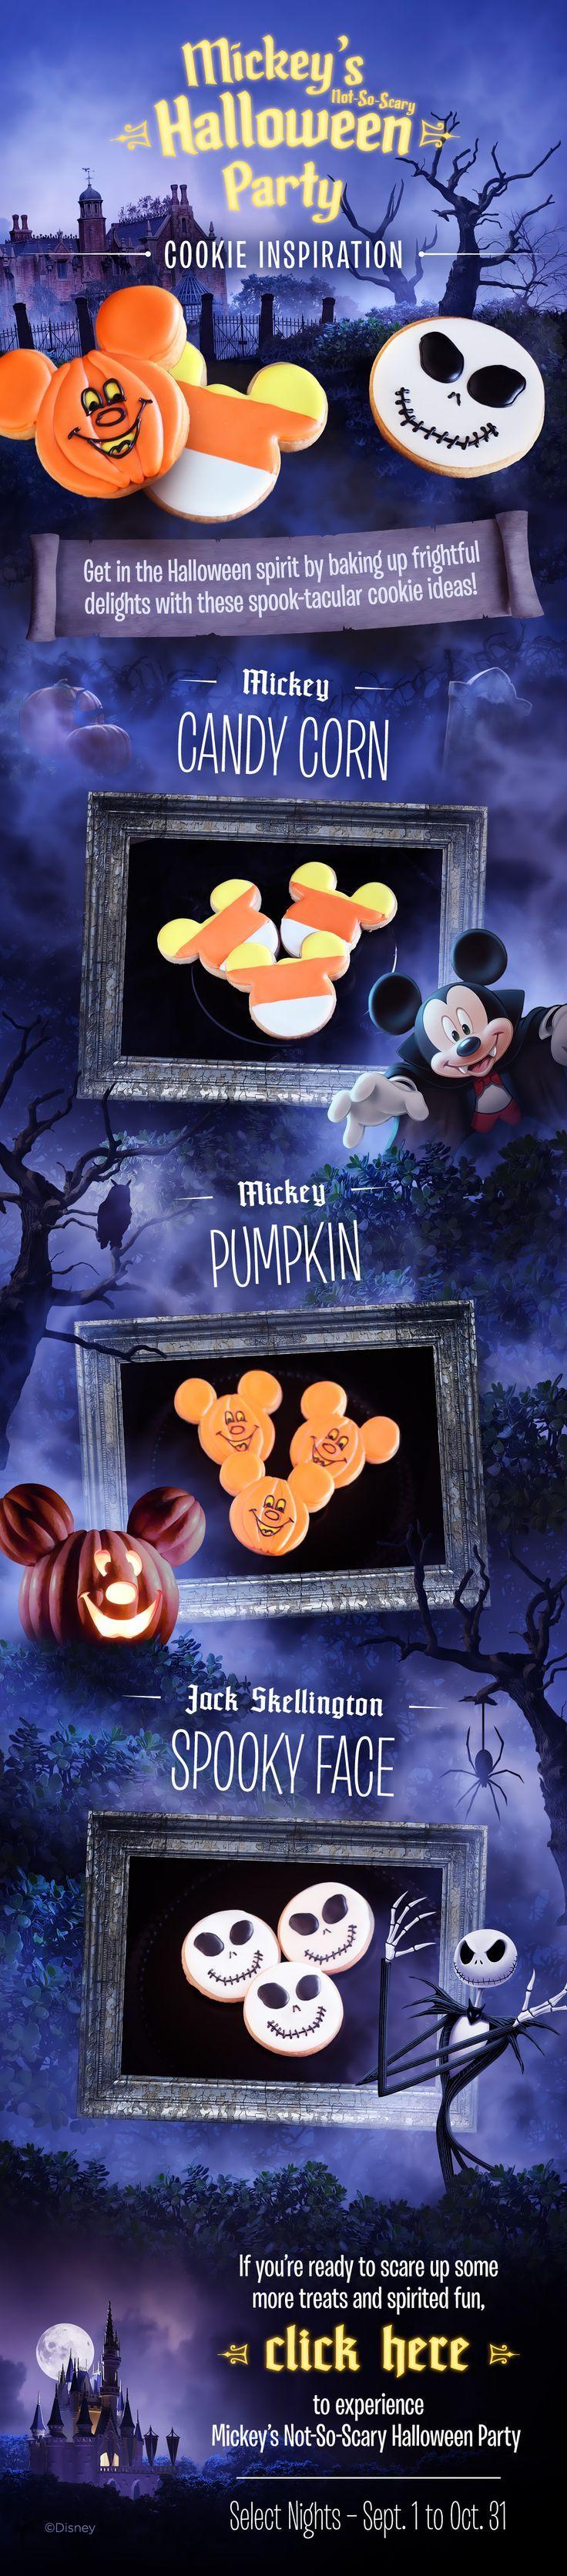 Mickey's #NotSoScary Halloween Party cookie inspiration! #DIY #waltdisneyworld